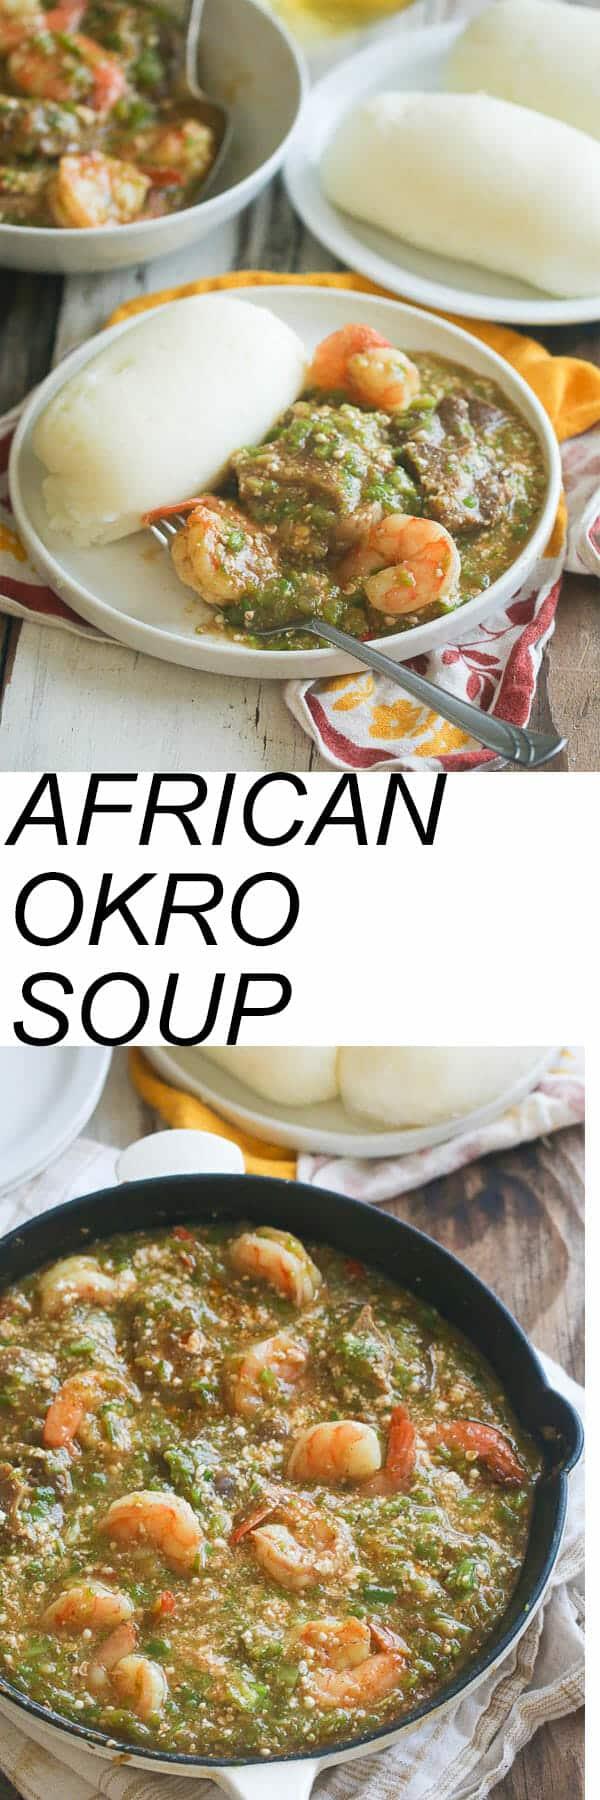 African okro-soup